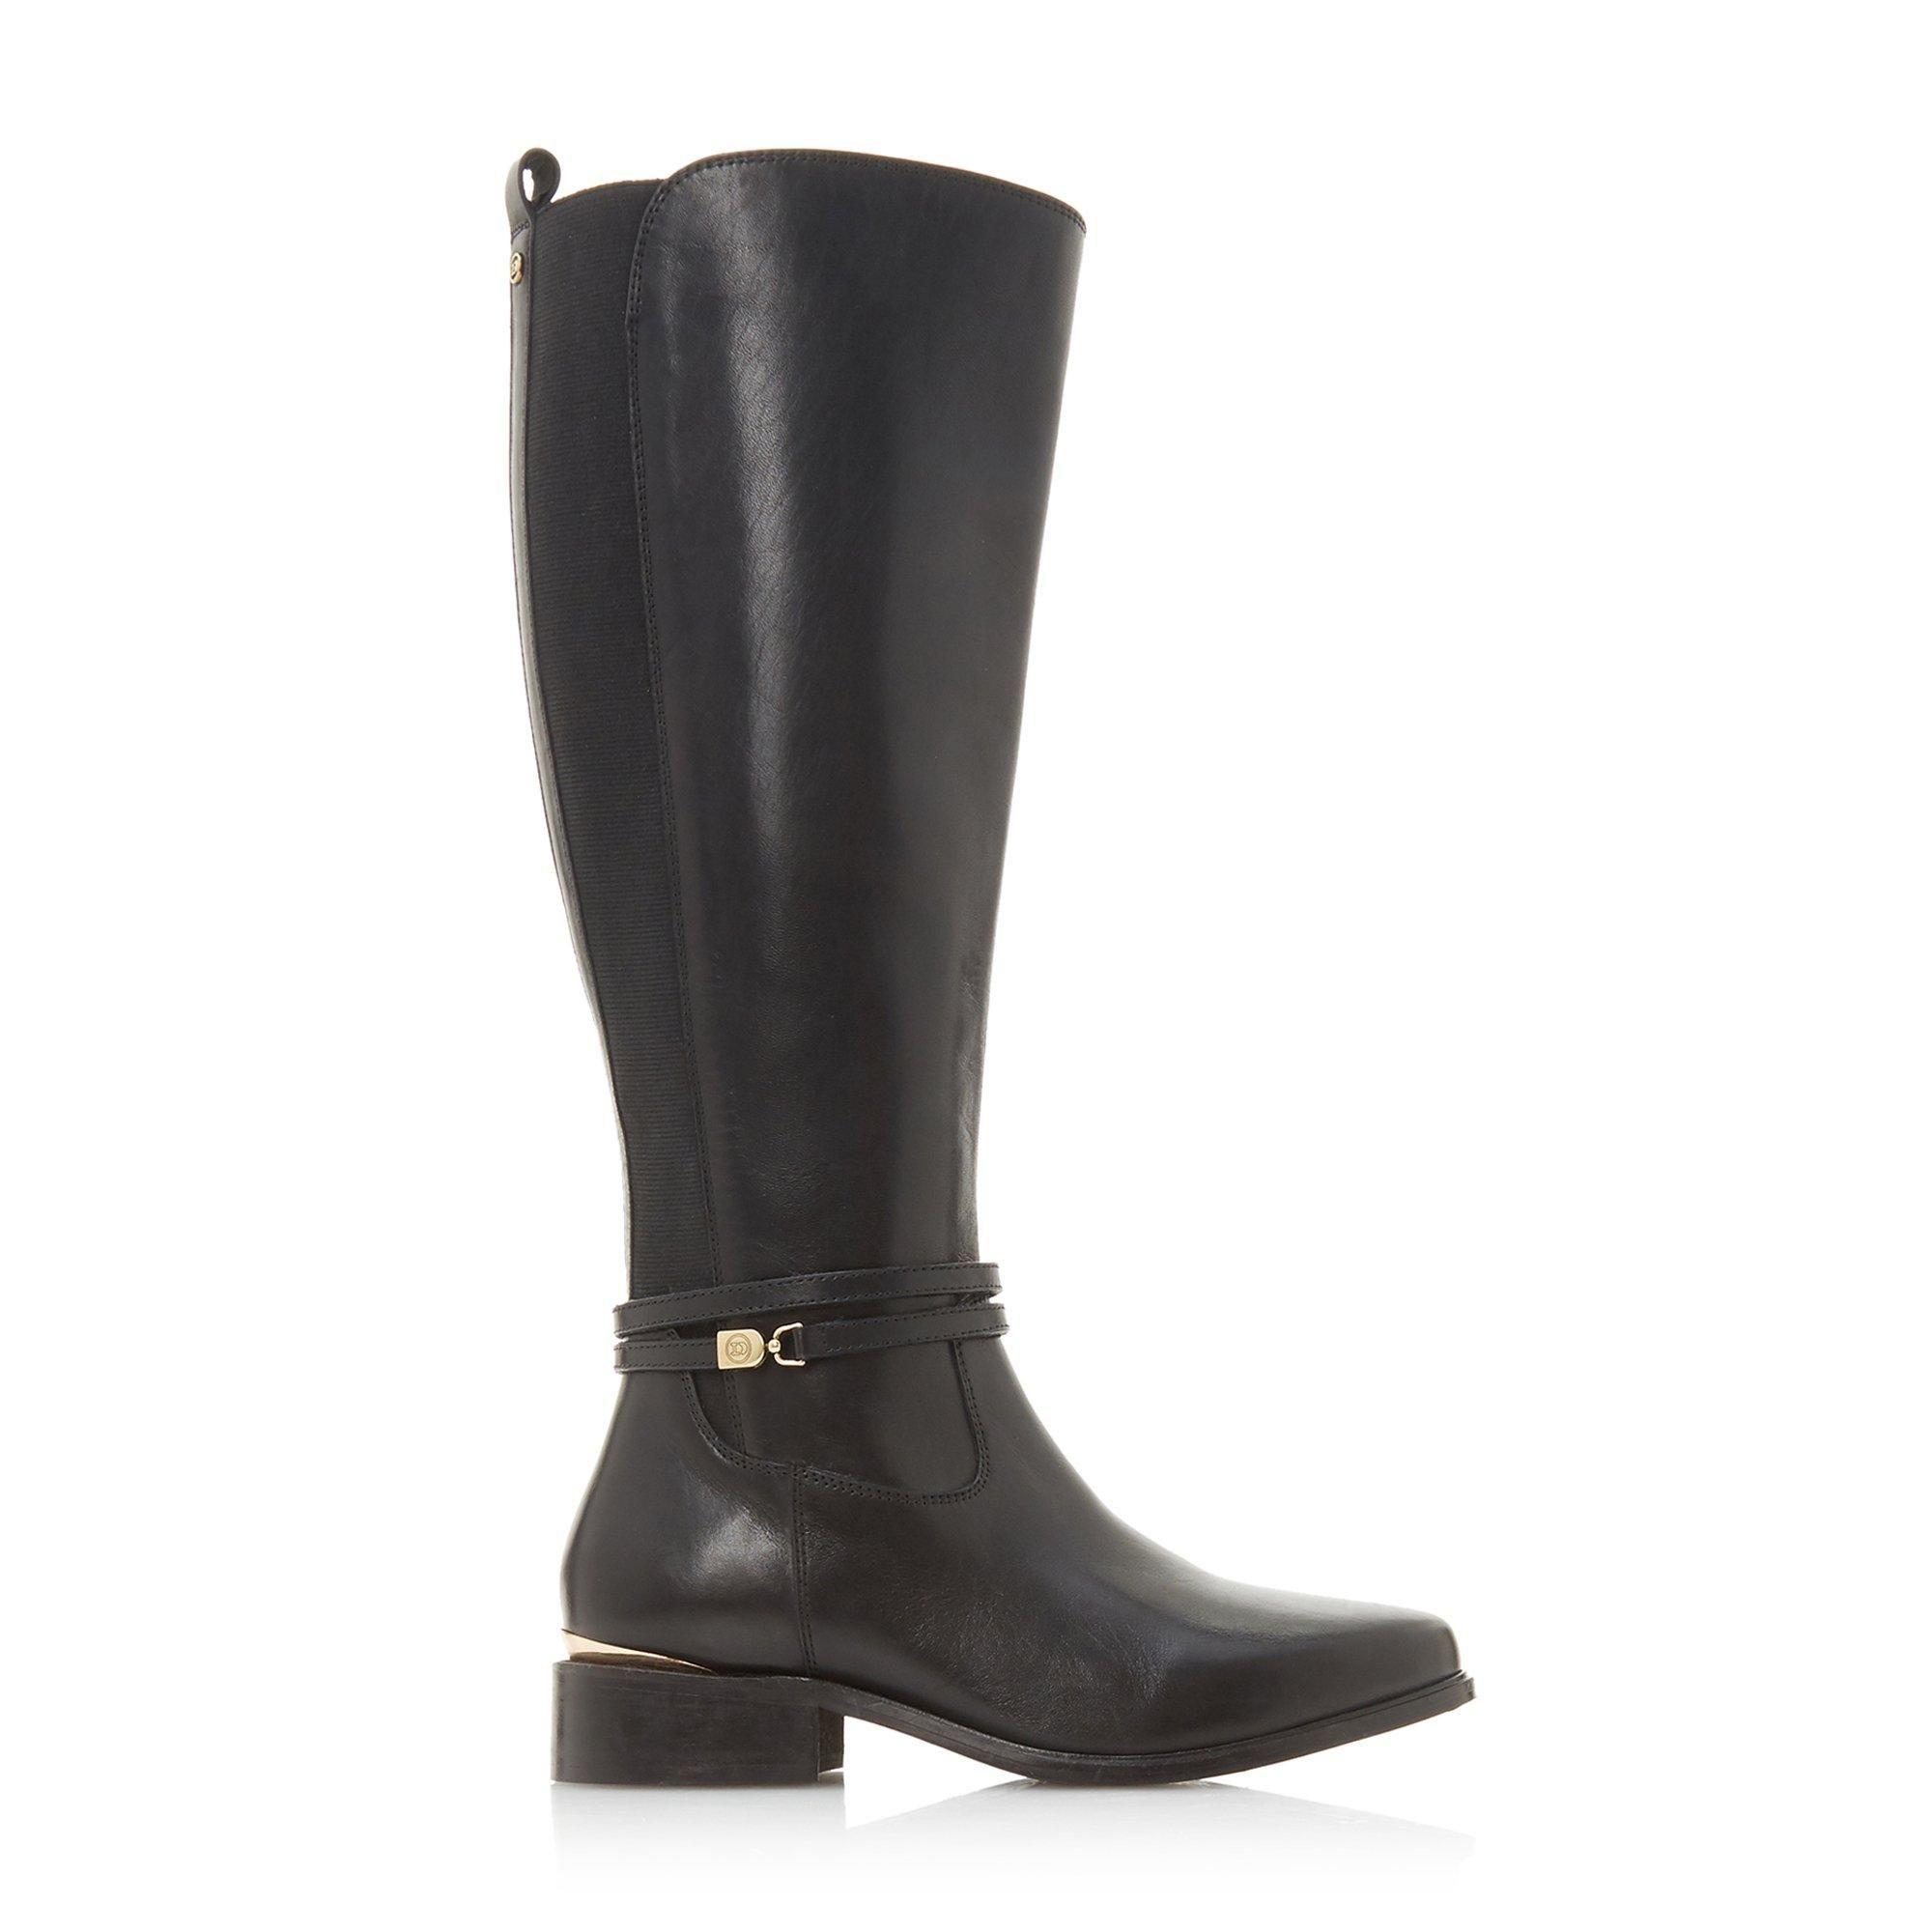 Dune Ladies WF TRAVISS Wide Fit Knee High Boots